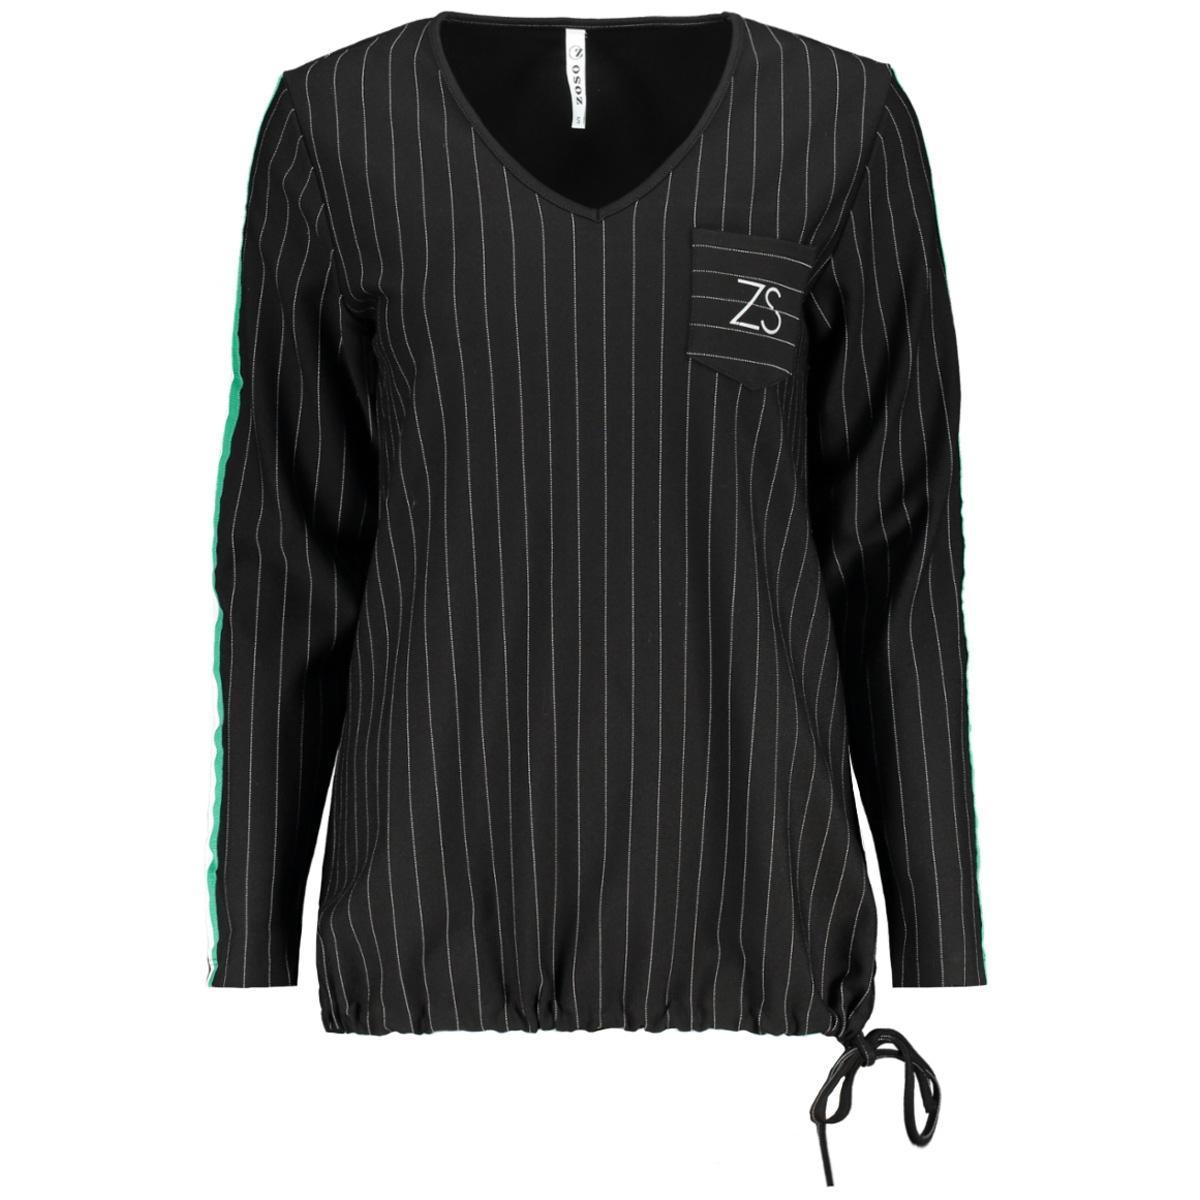 seattle 2 pinstripe sweater zoso trui black/green